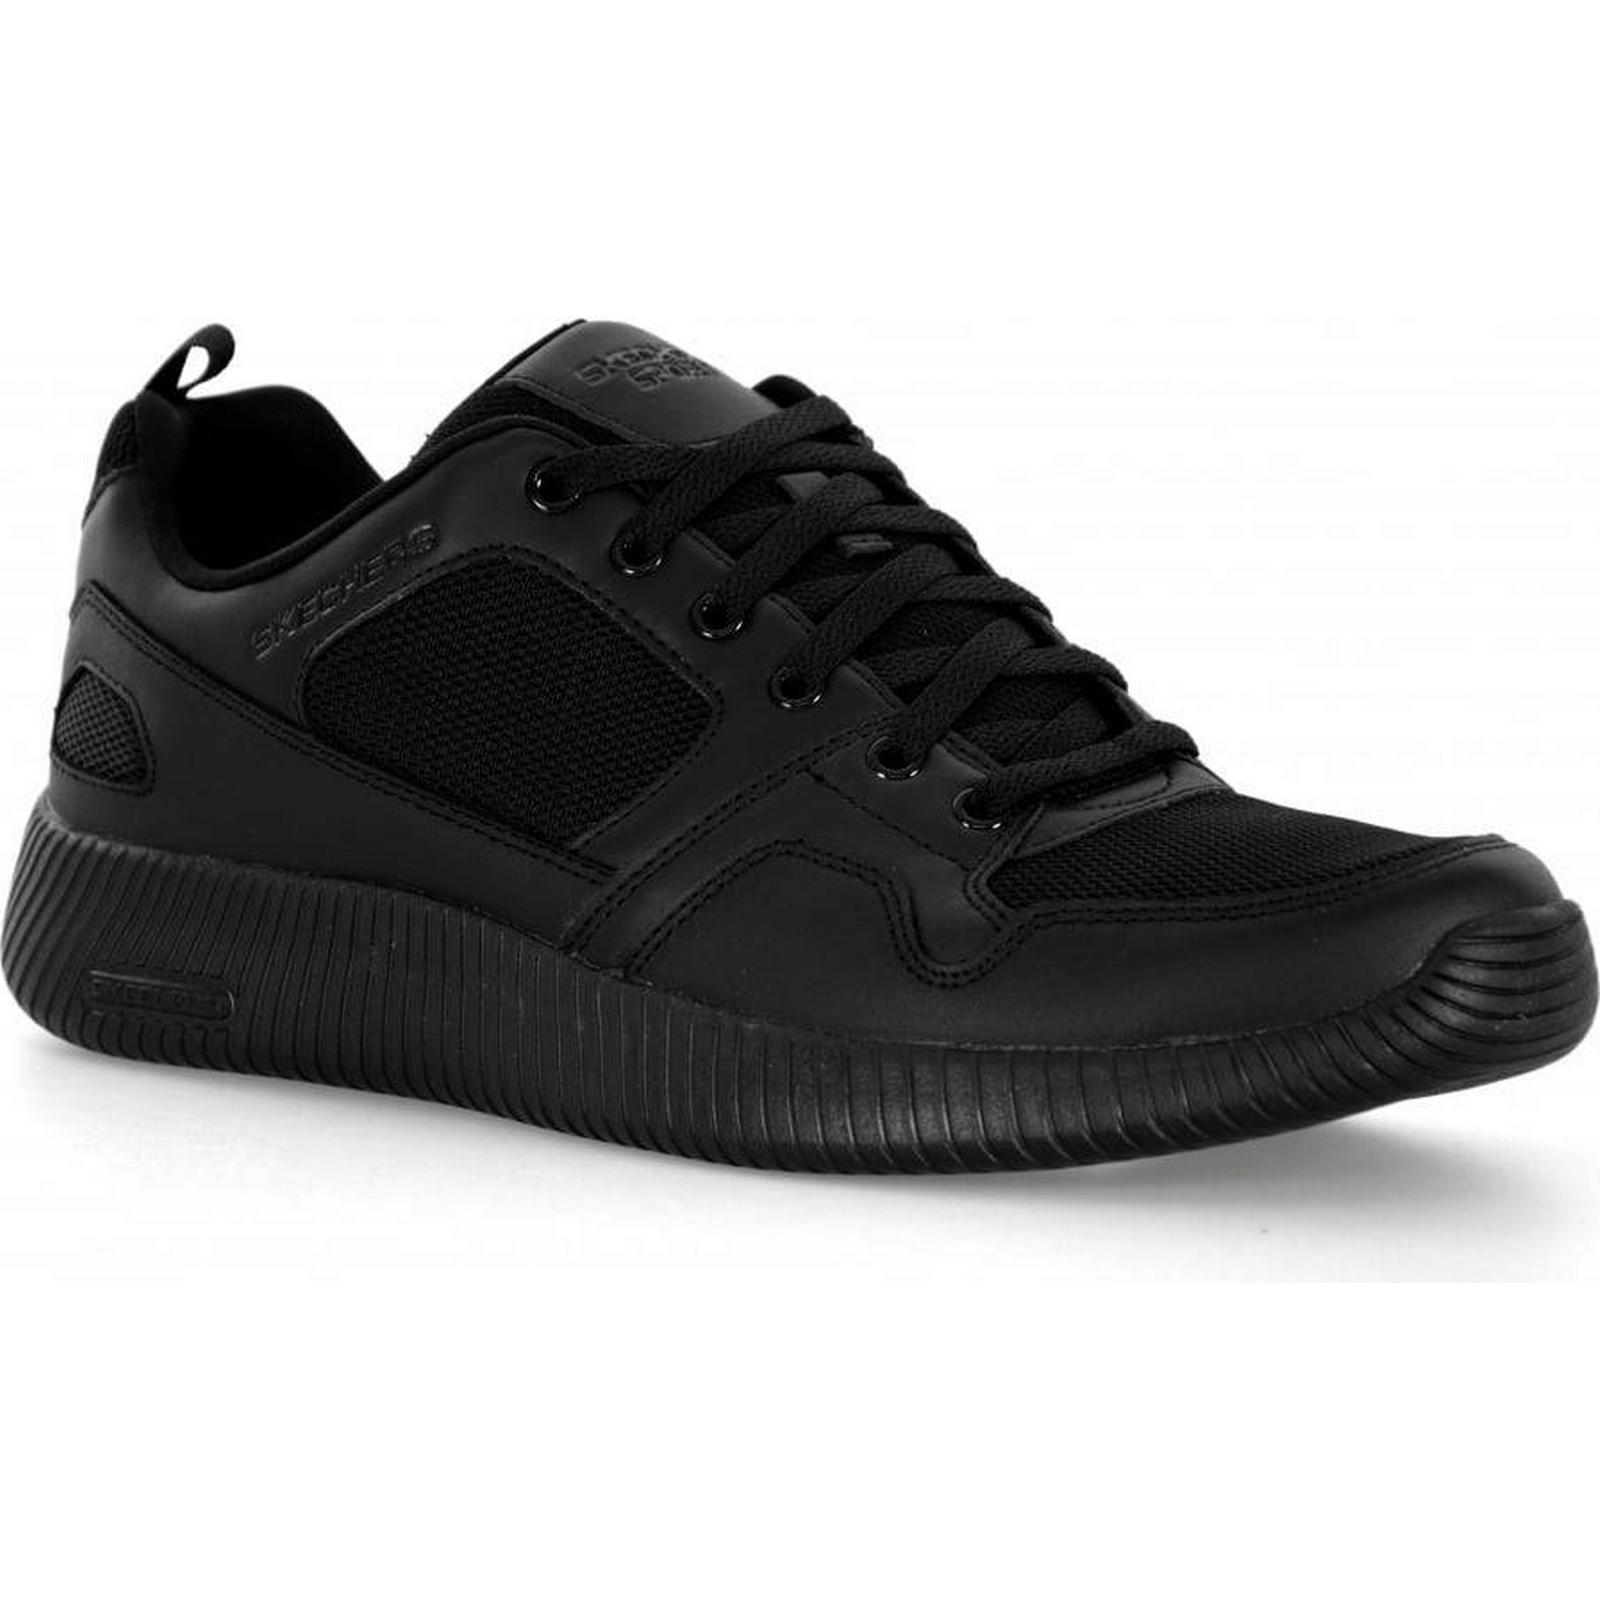 Skechers Mens Depth Charge Yanda 317 Colour Trainers (Black) Size: 10, Colour 317 9db2a9